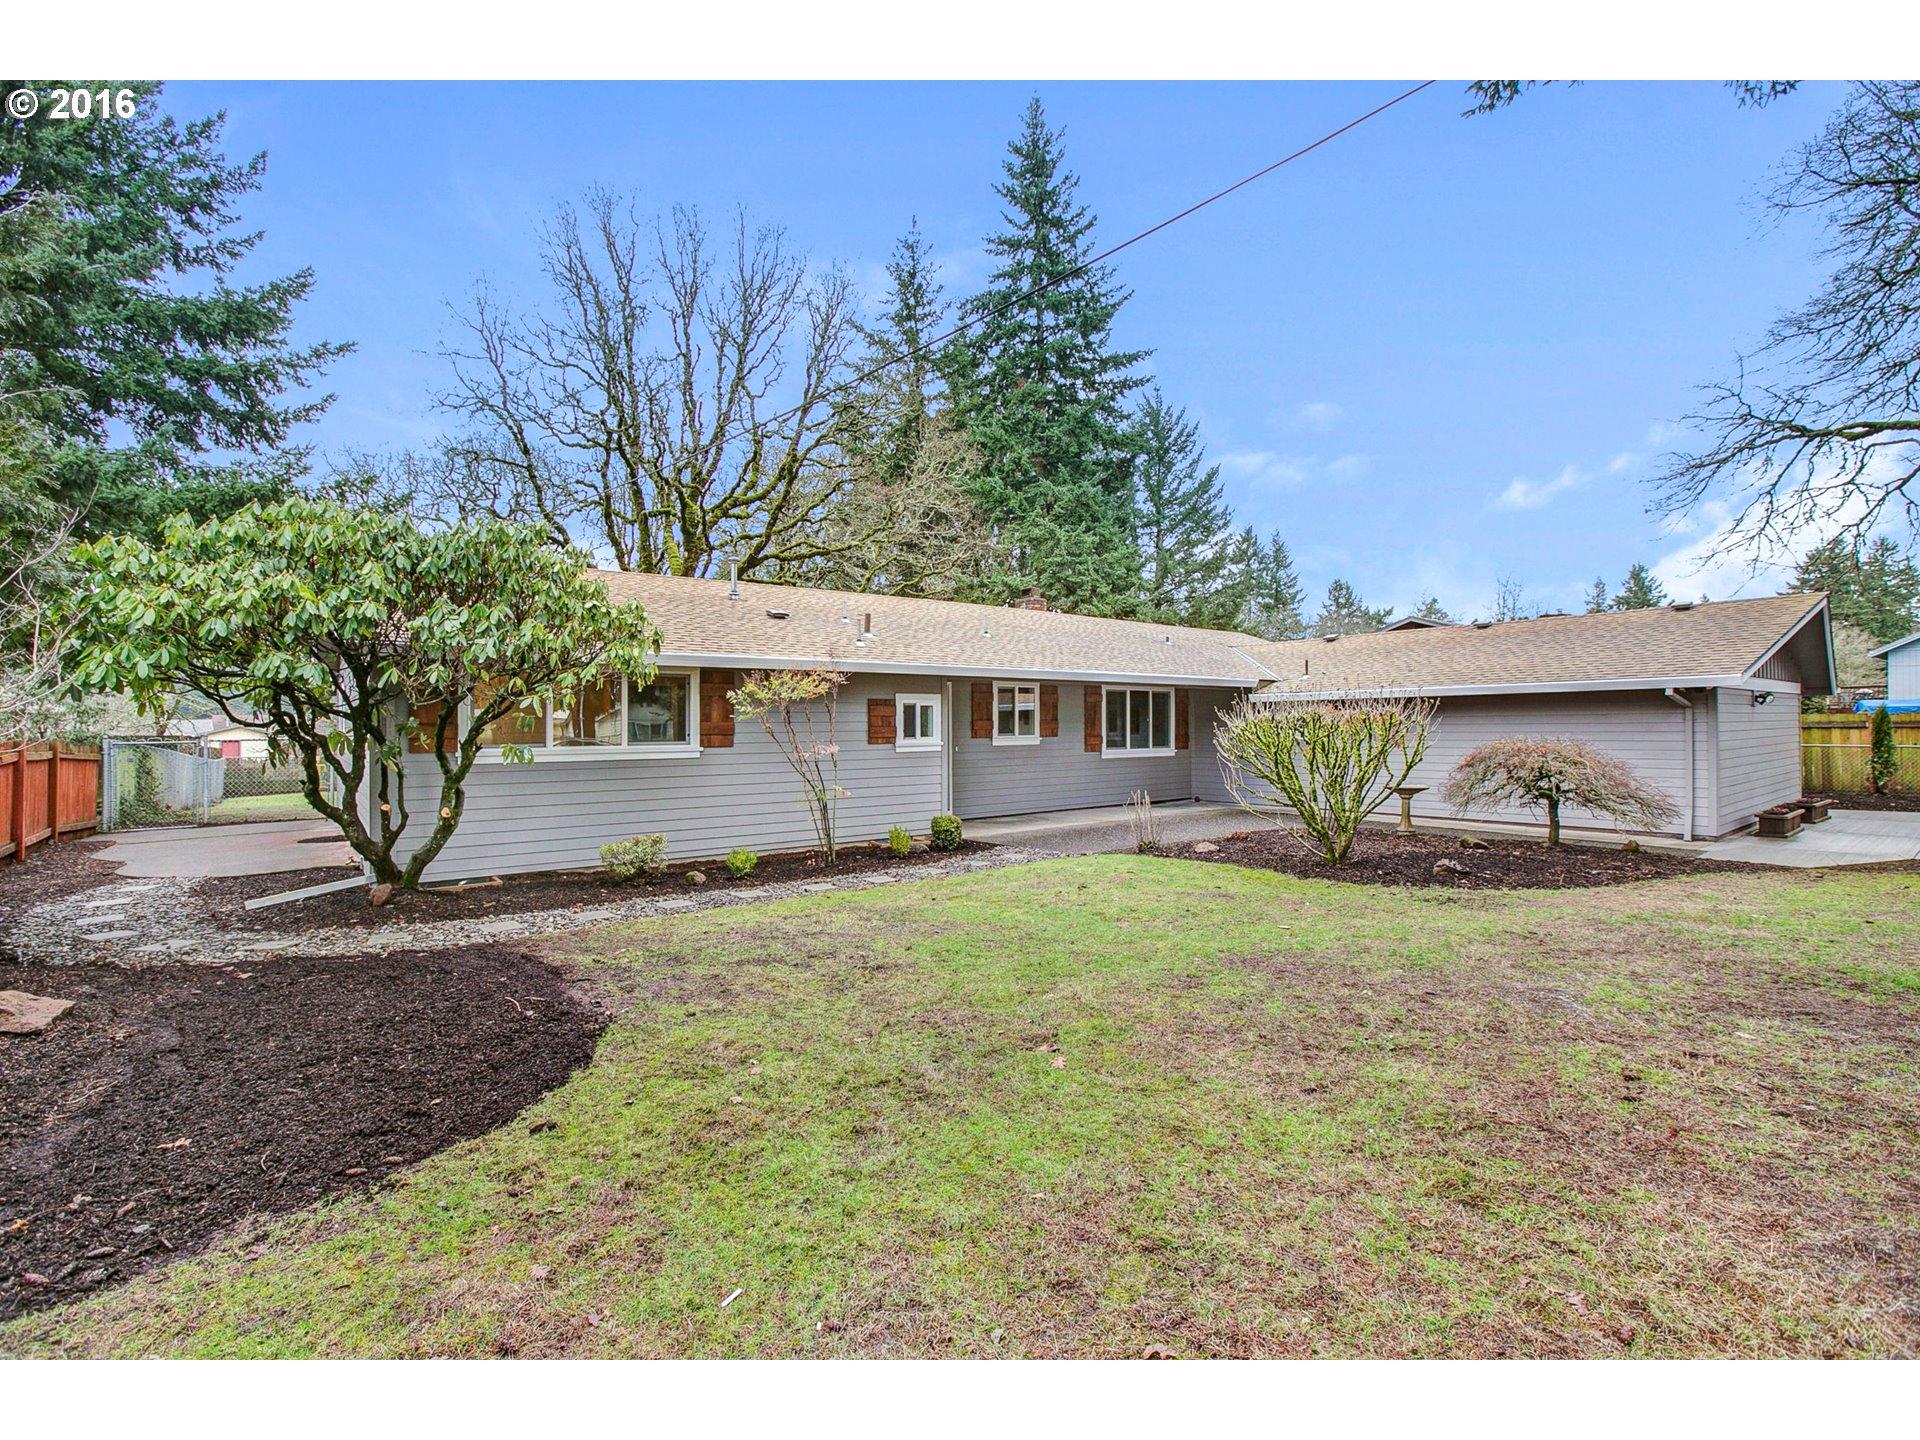 13898 SE Maple Ln, Portland, OR 97222